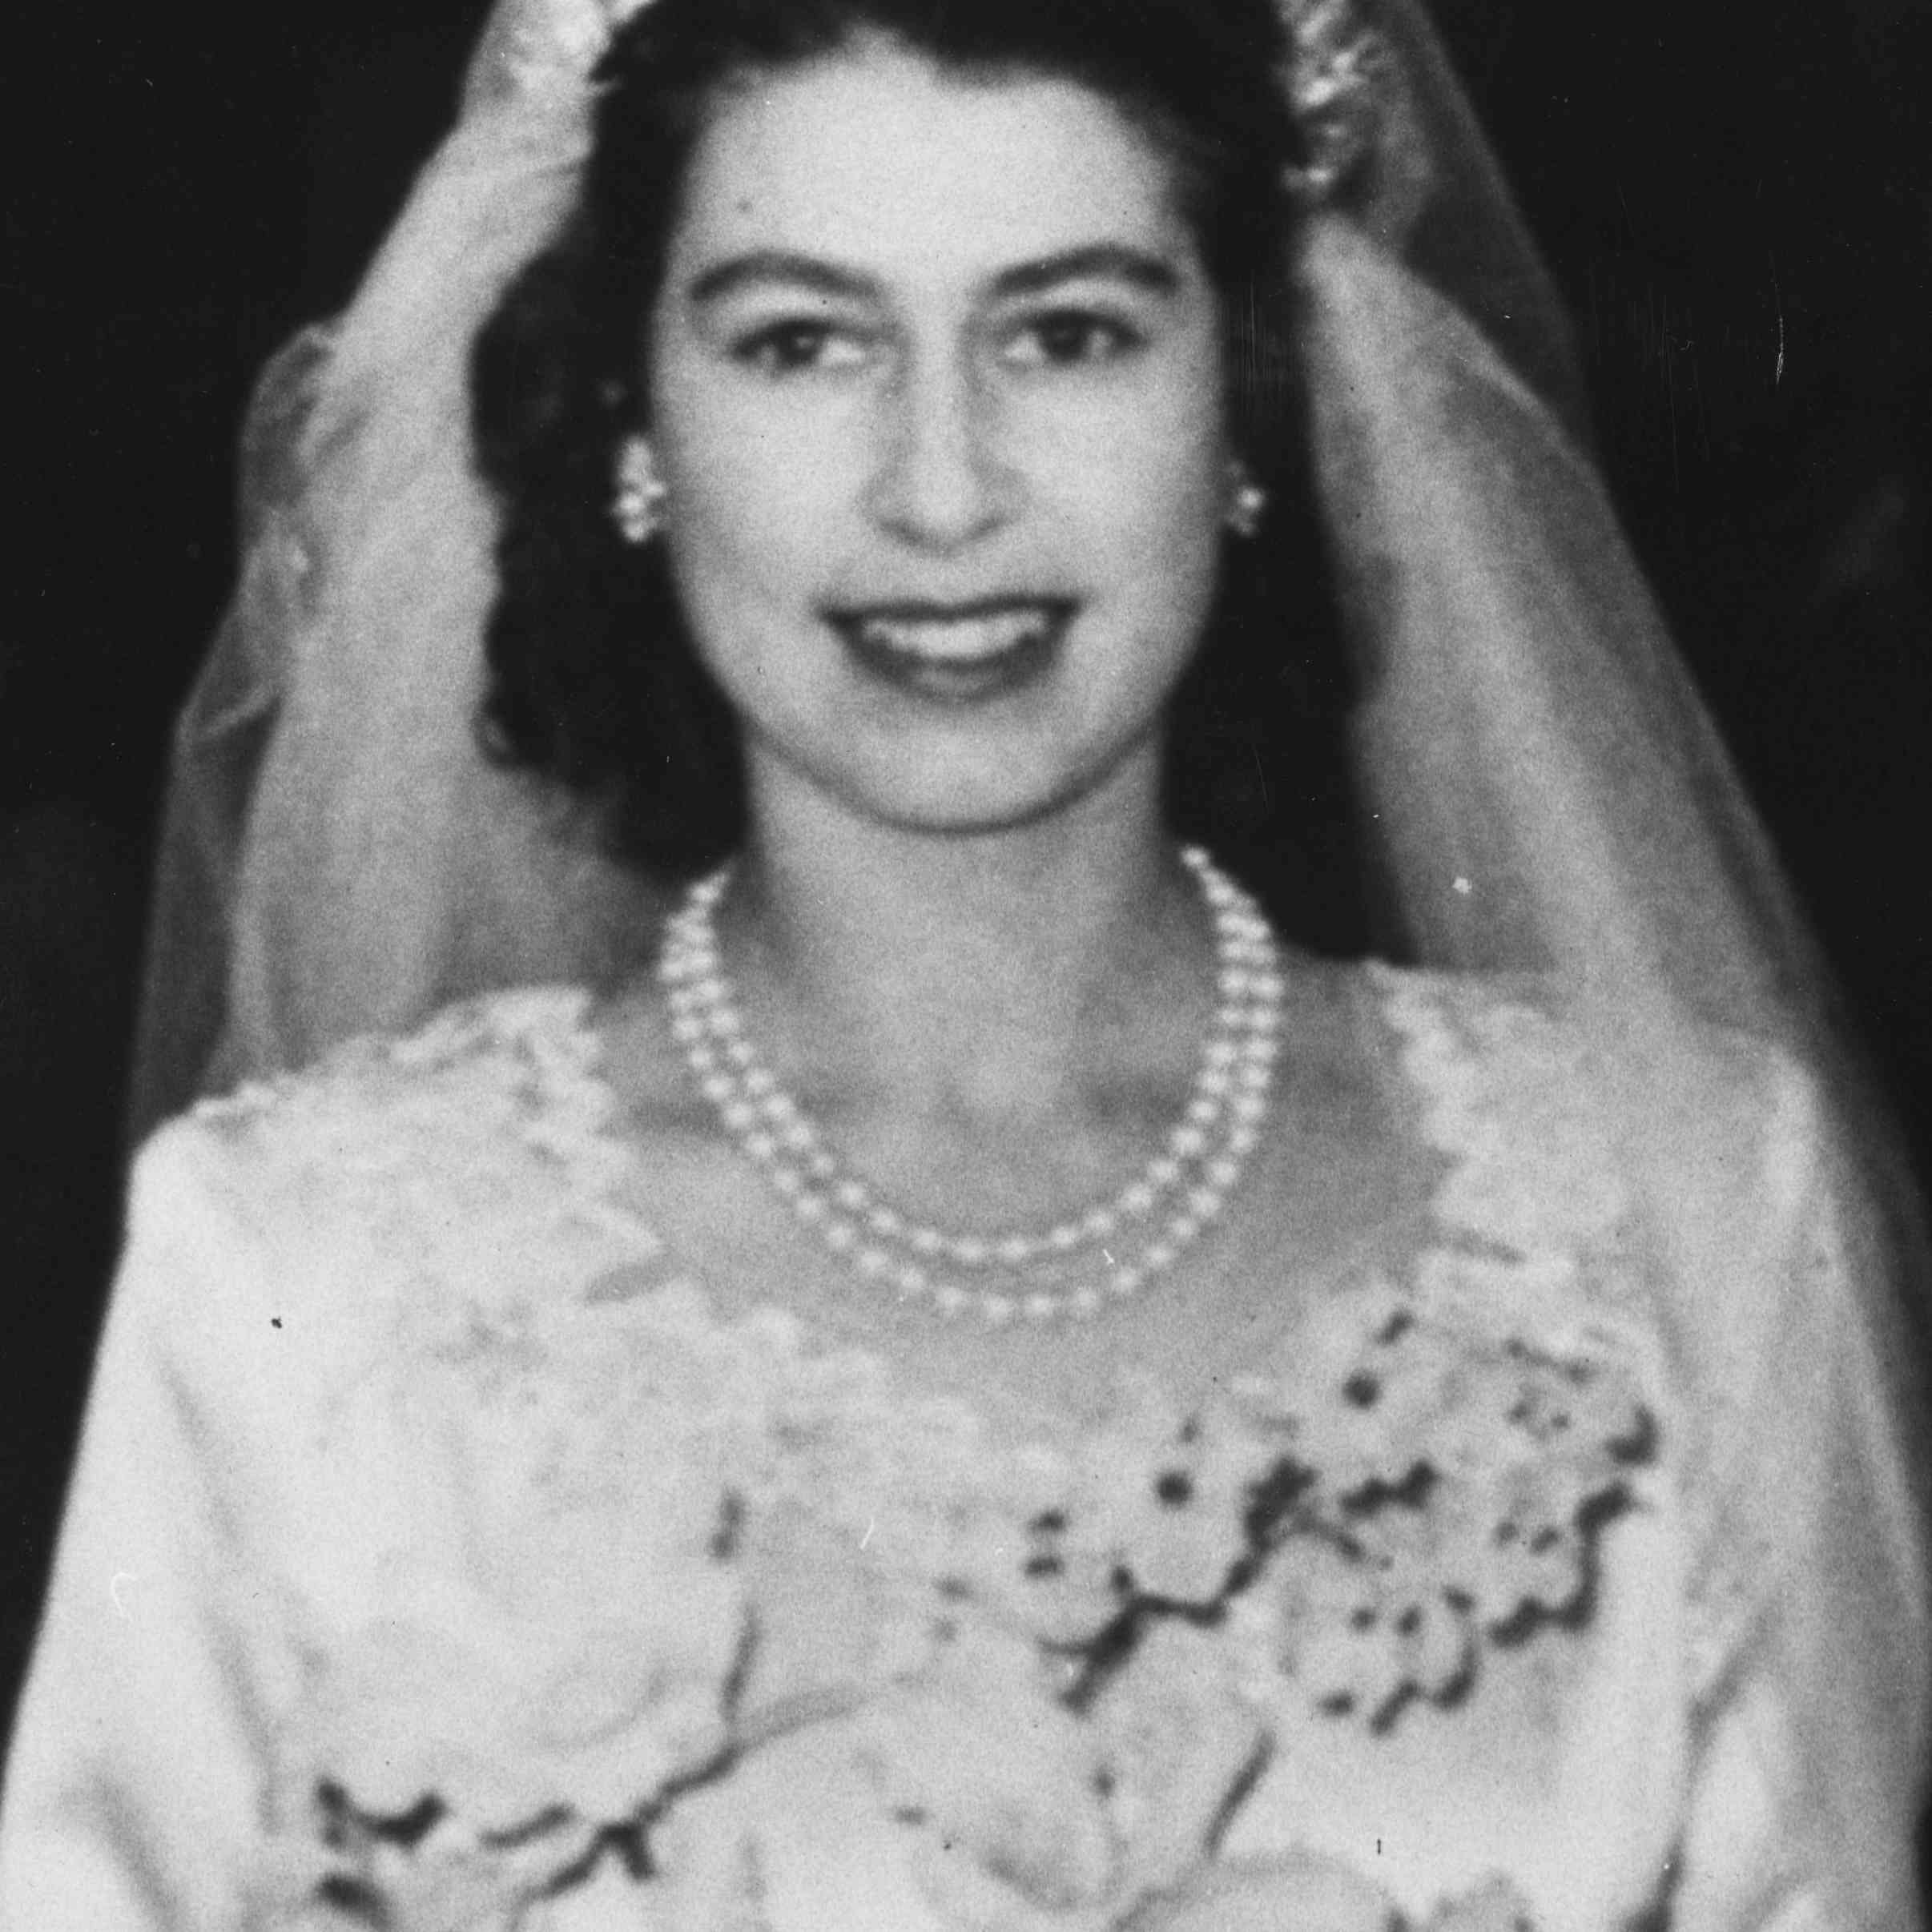 Princess Elizabeth leaving Westminster Abbey after her wedding to Prince Philip, Duke of Edinburgh